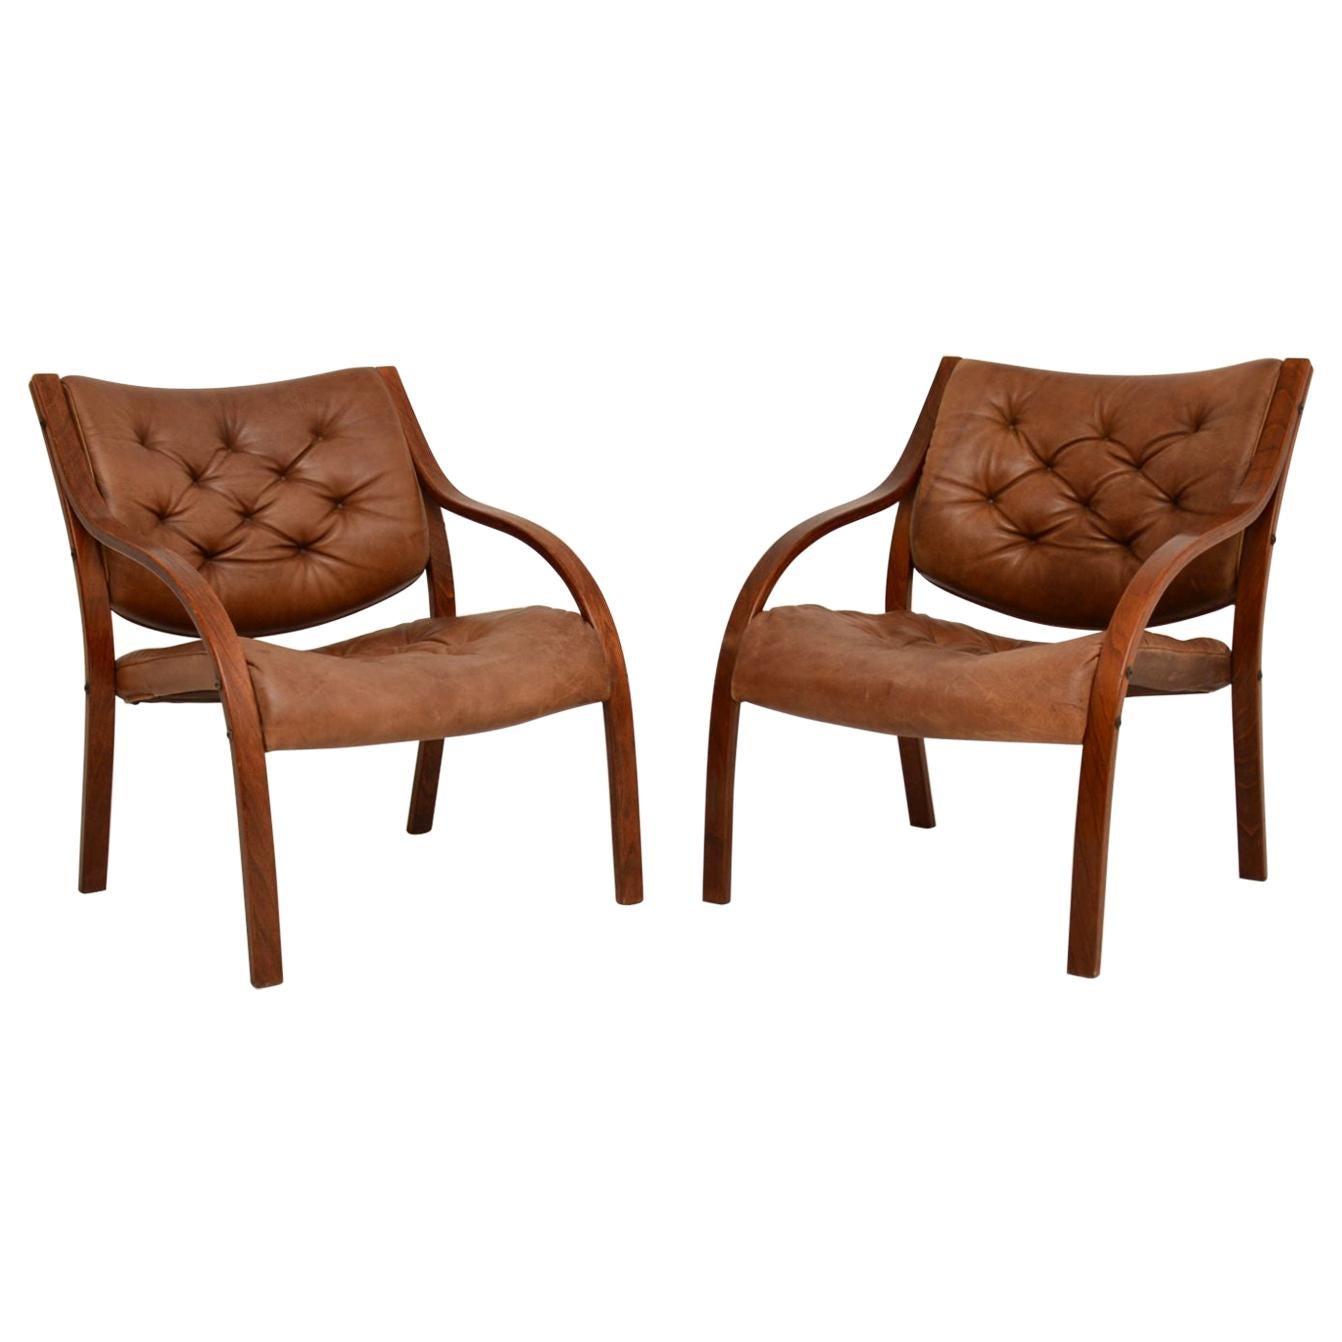 Pair of Scandinavian Bentwood & Leather Vintage Armchairs